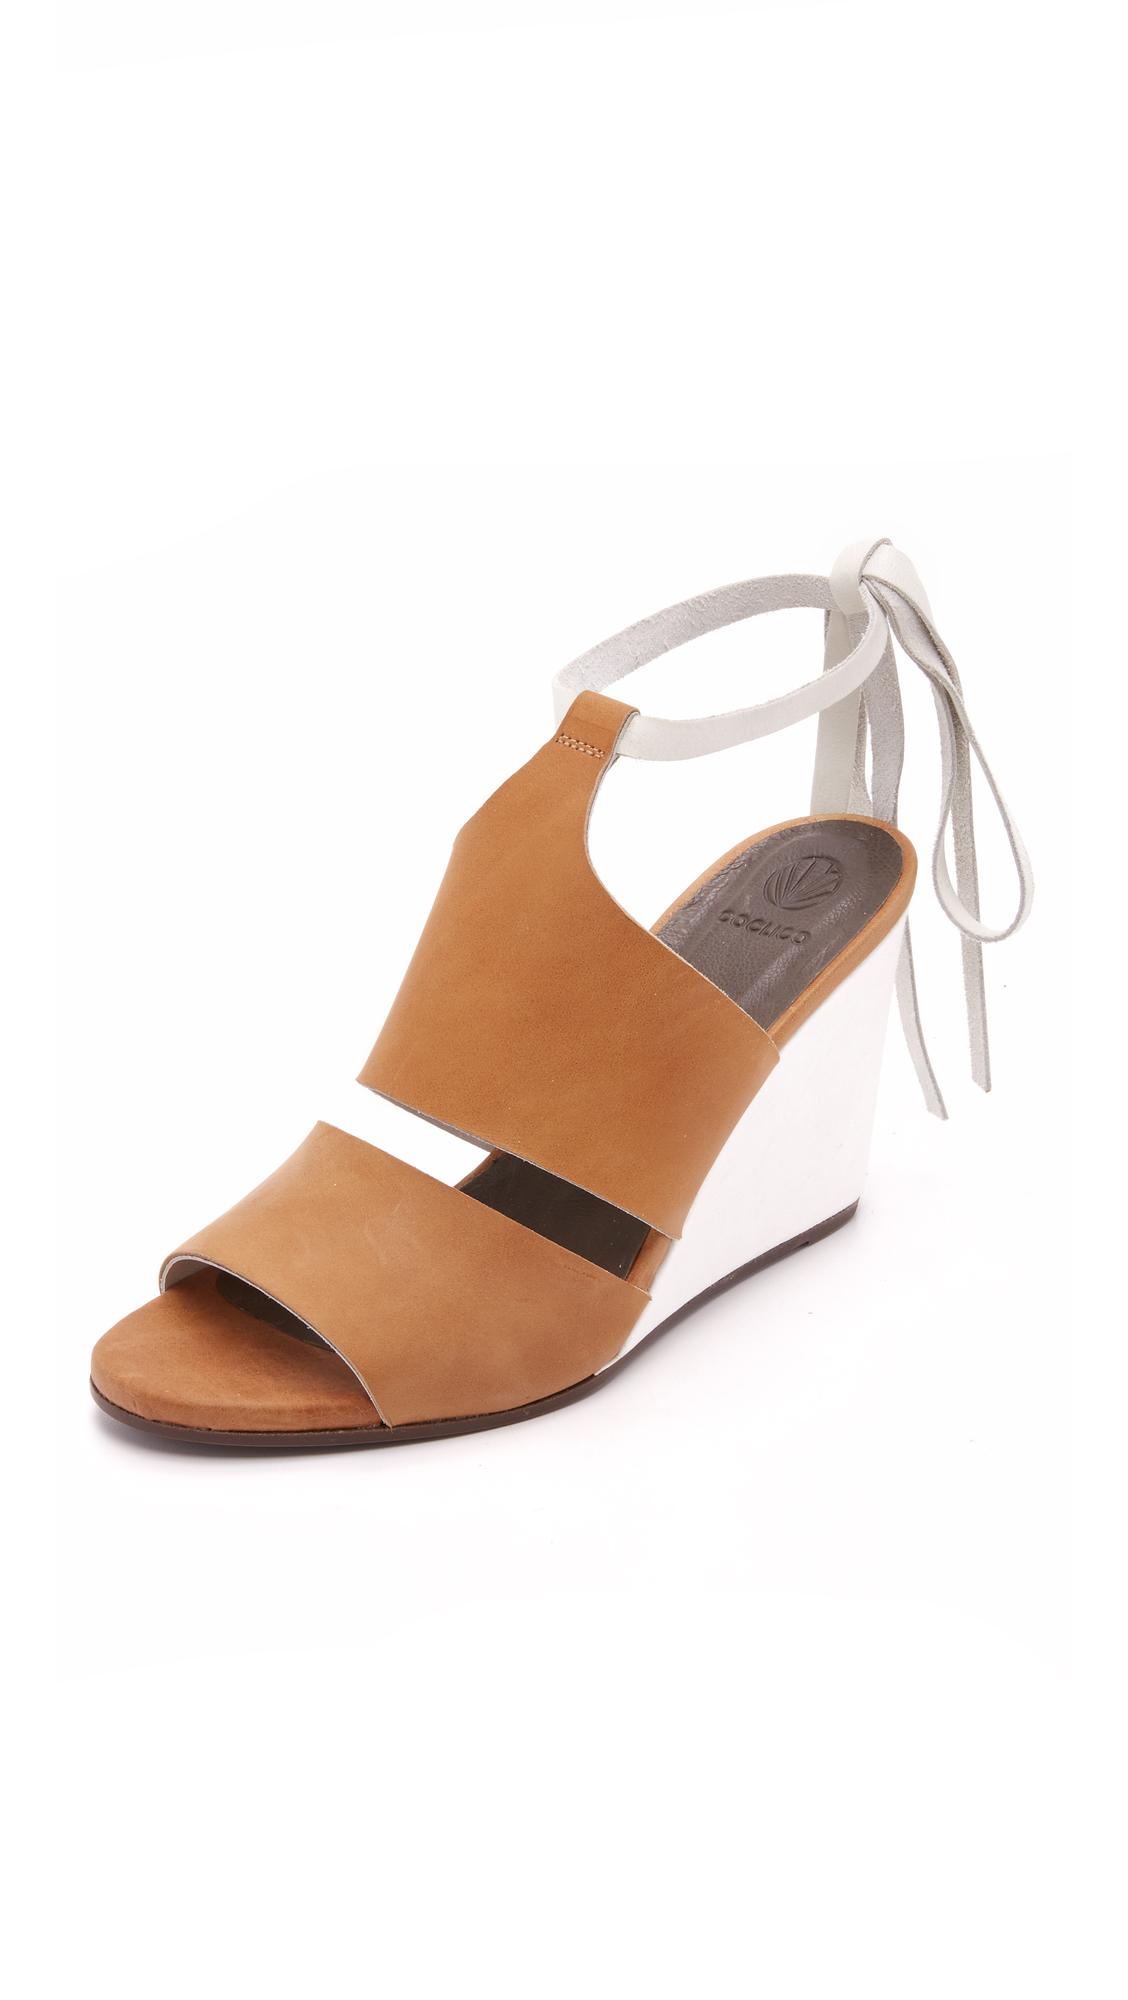 Coclico Shoes Jewel Wedges - Sahara at Shopbop